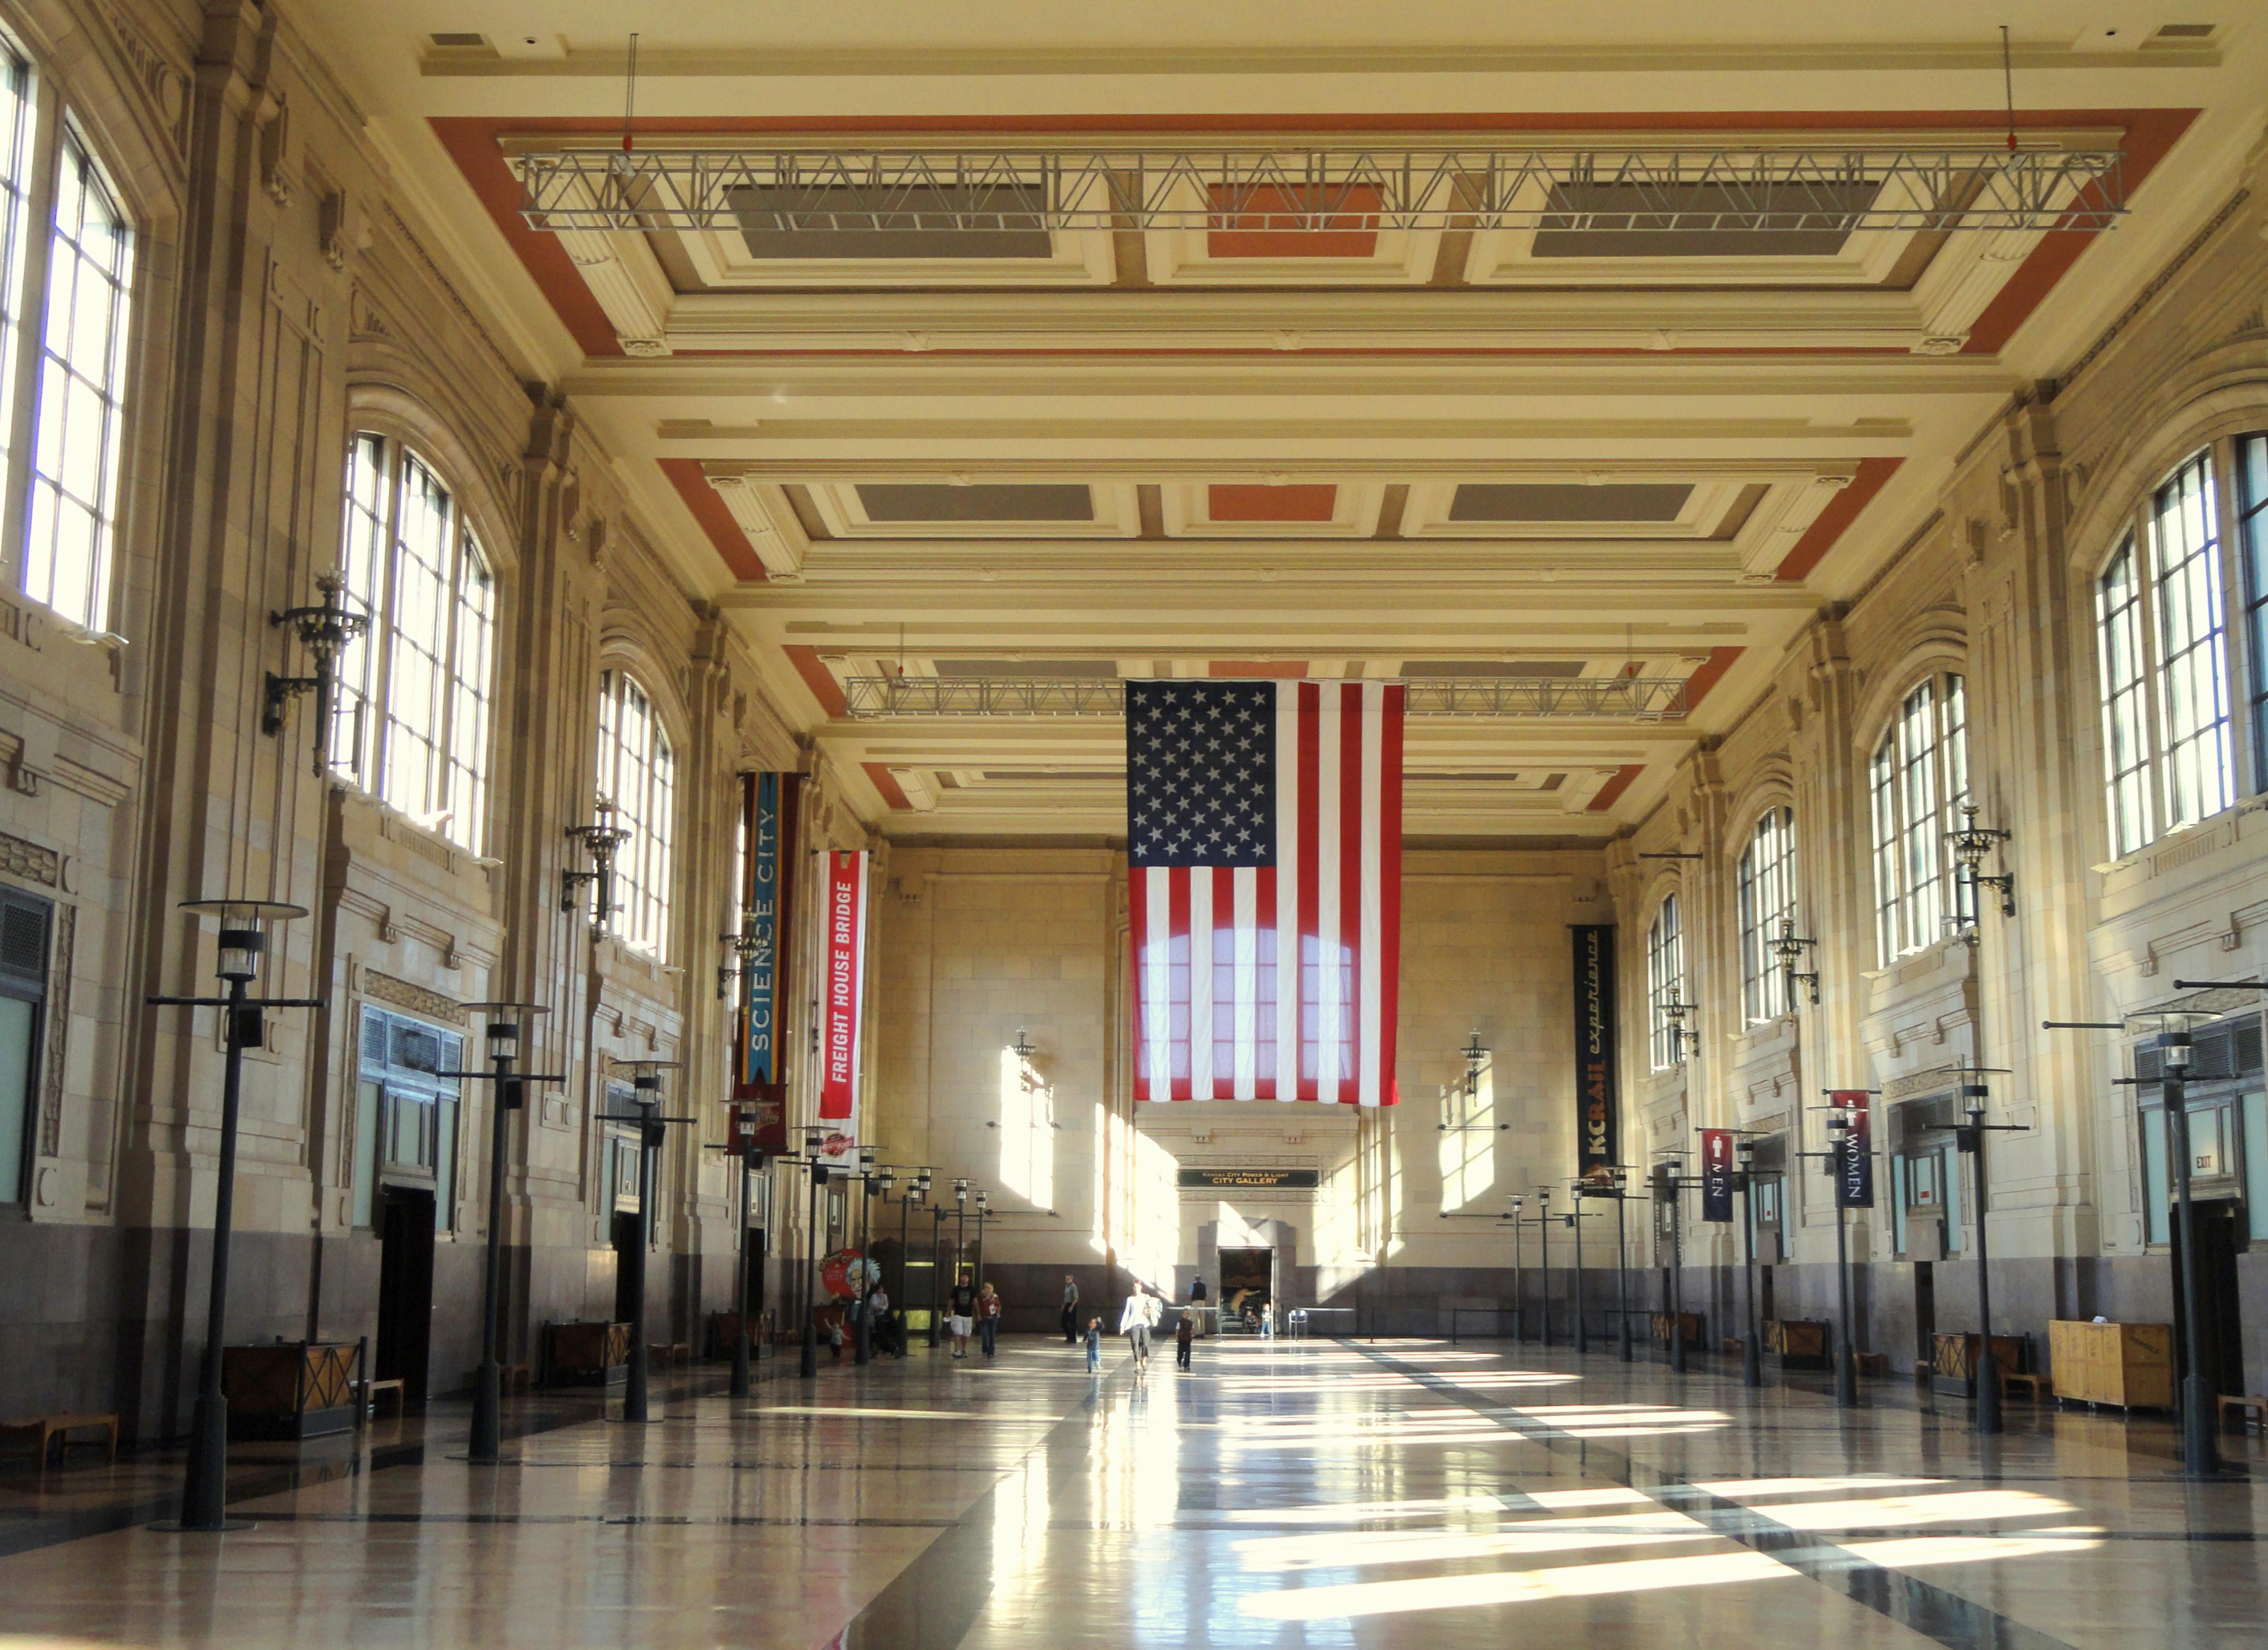 Kansas City Central Train Station